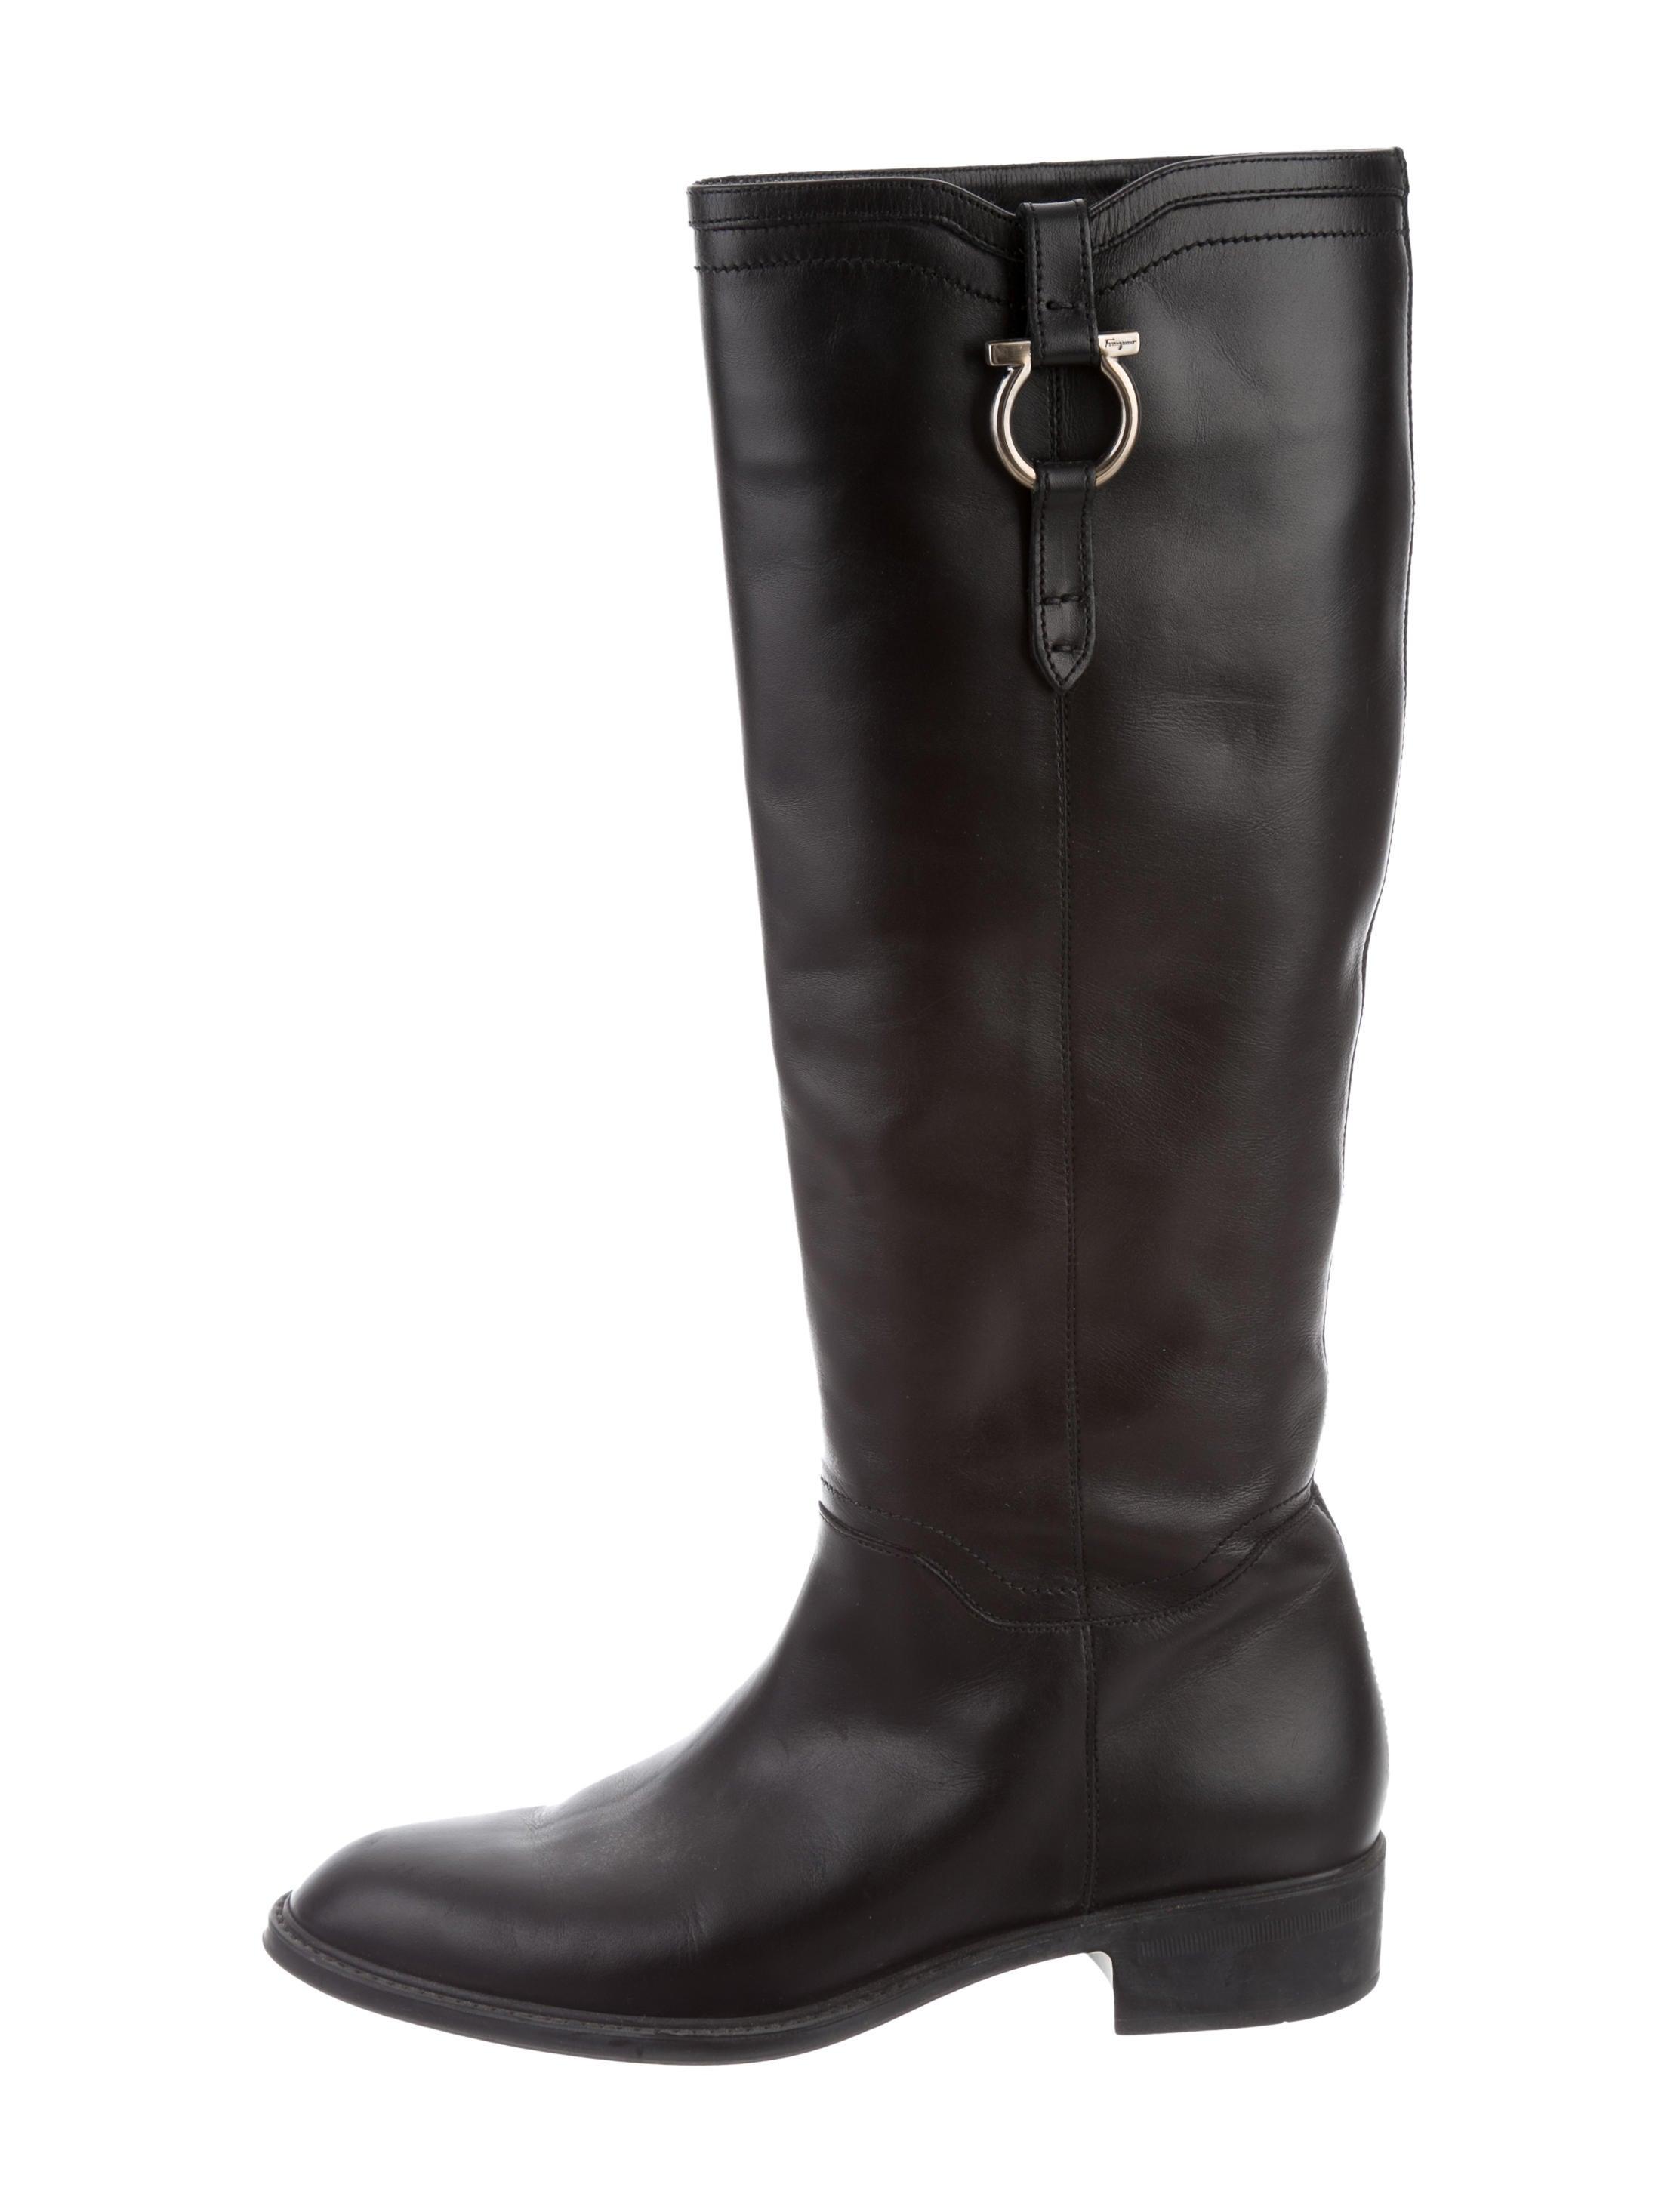 Salvatore Ferragamo Gancini Embellished Leather Boots